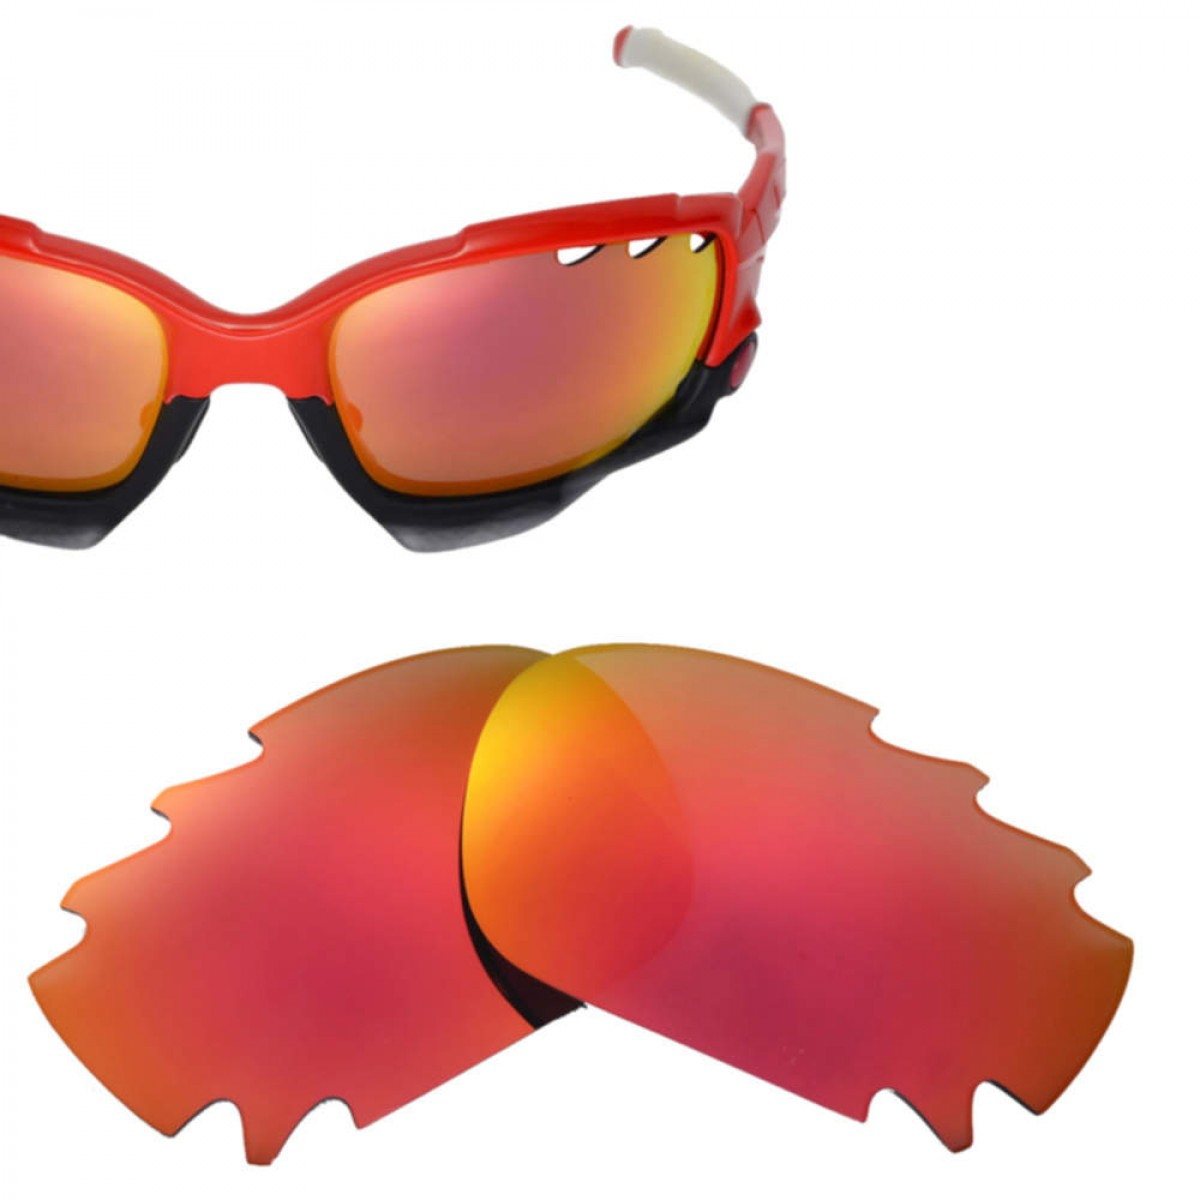 e0969df67dc2 Cofery Lenses Store Cofery Vented Replacement Lenses for Oakley Jawbone  Sunglasses